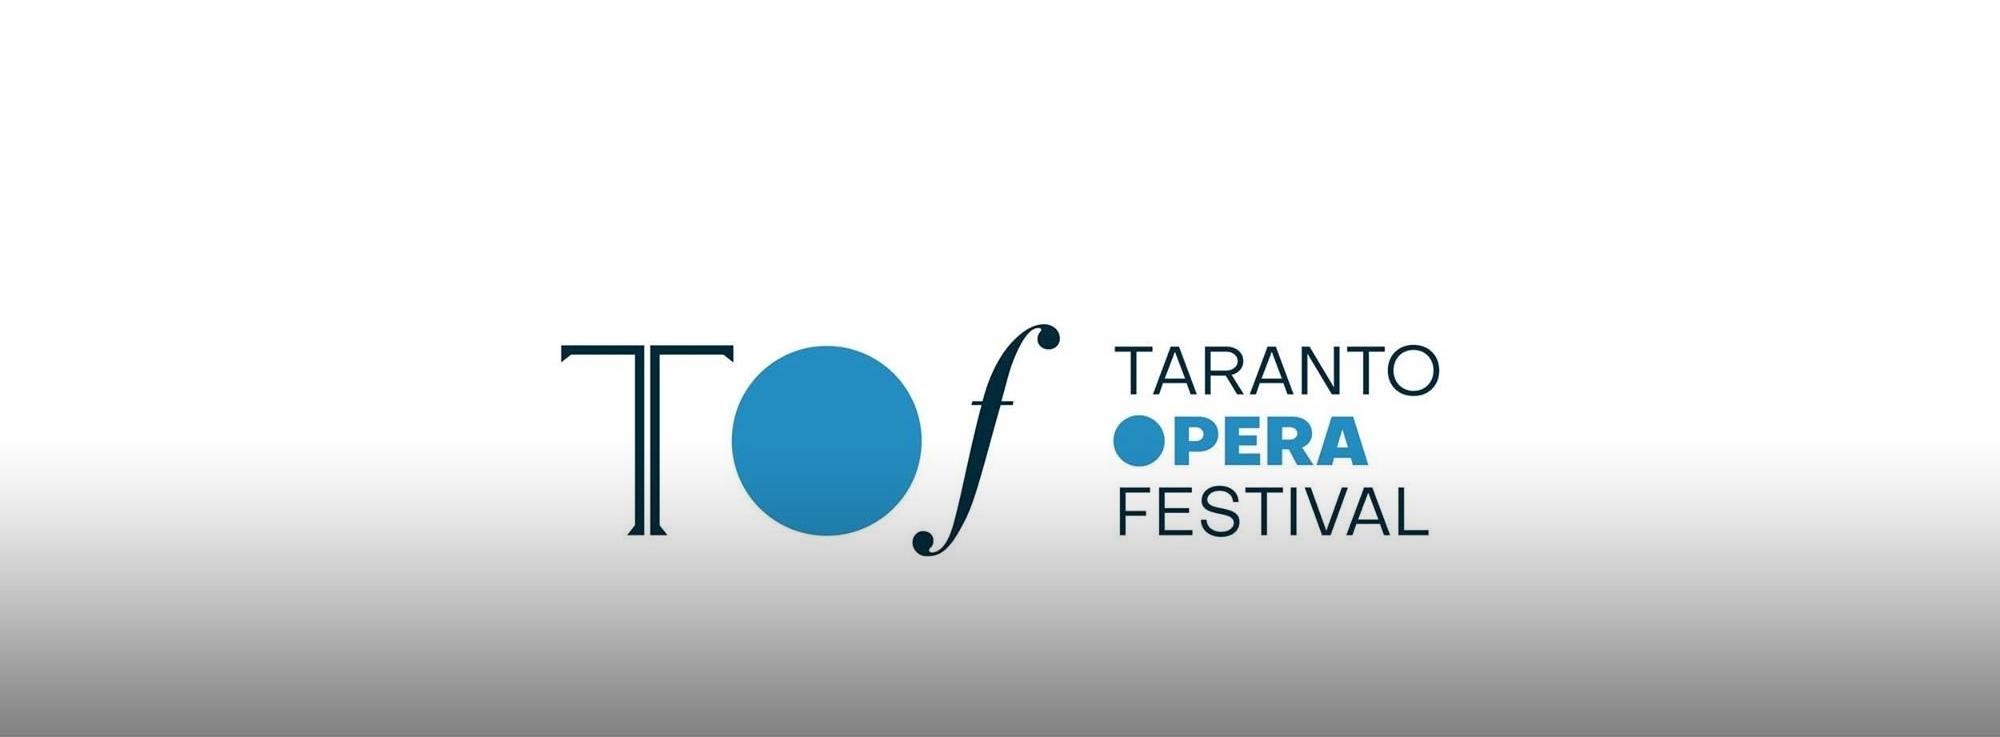 Taranto: Taranto Opera Festival